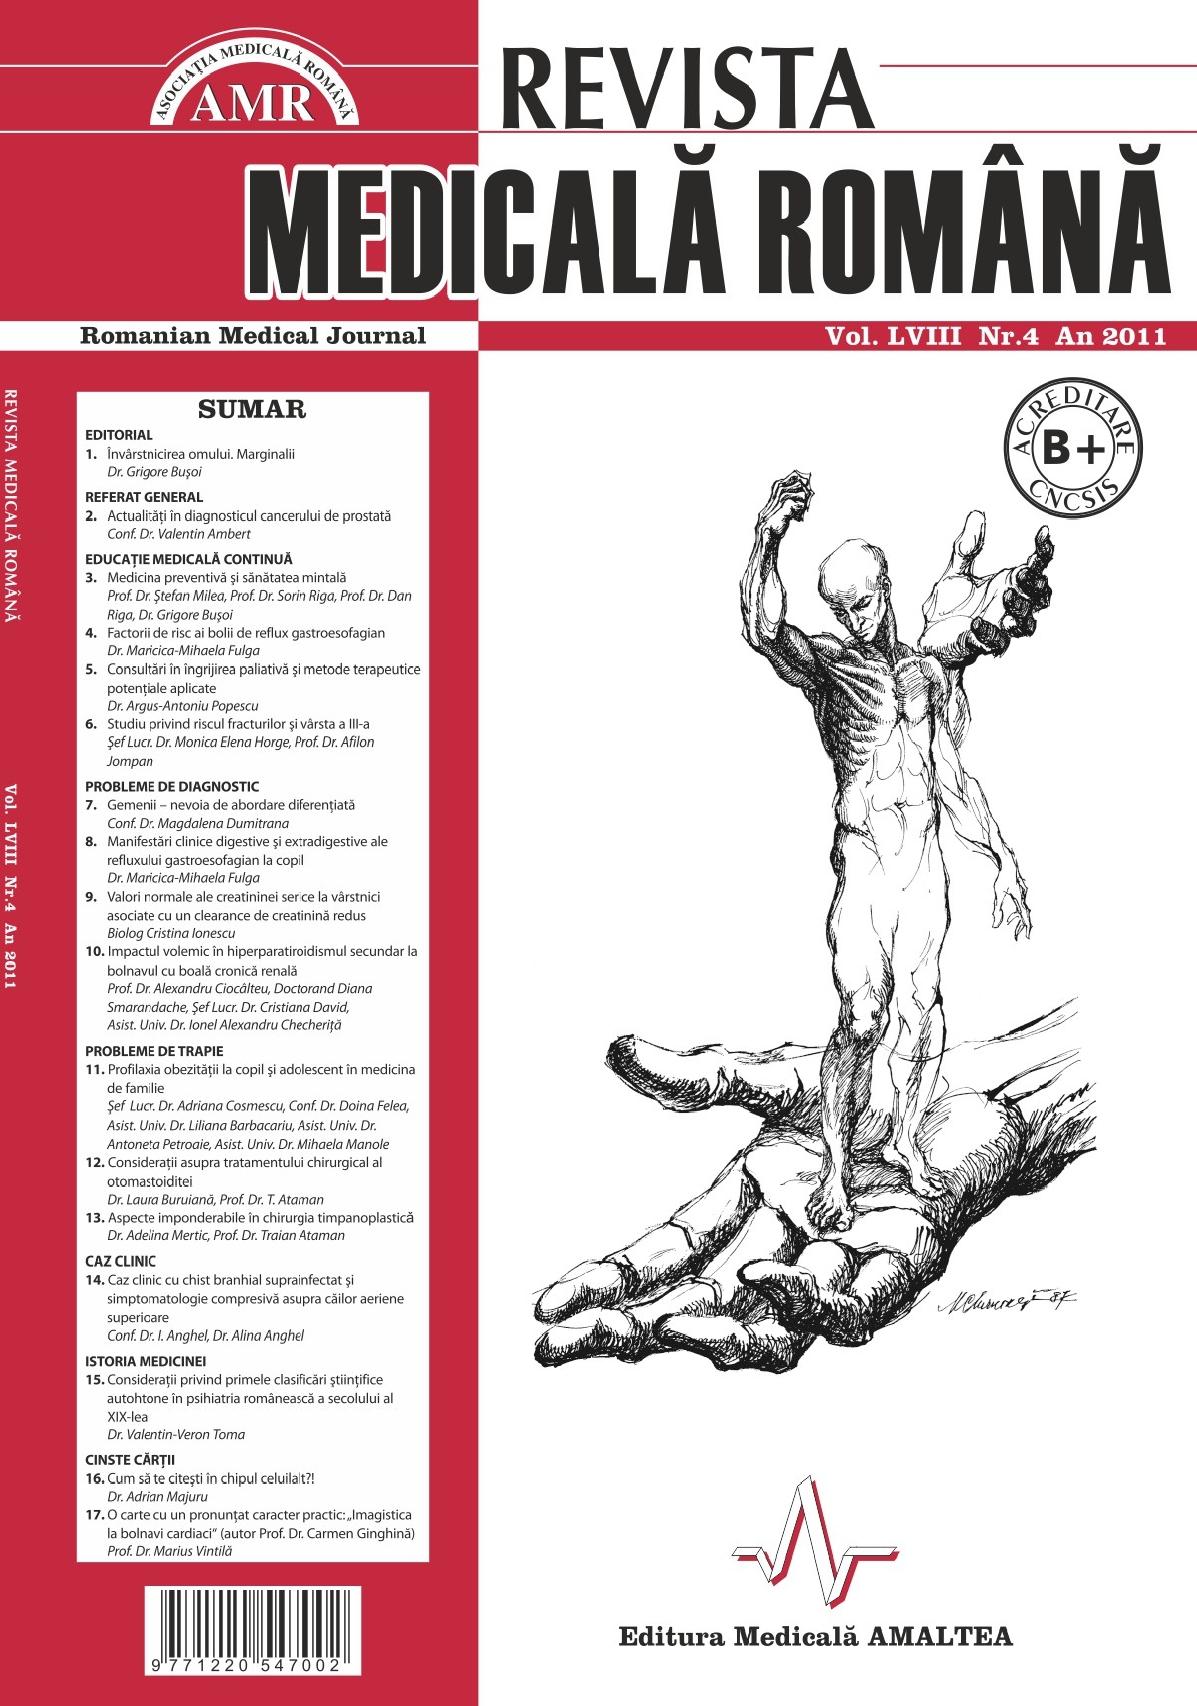 REVISTA MEDICALA ROMANA - Romanian Medical Journal, Vol. LVIII, Nr. 4, An 2011